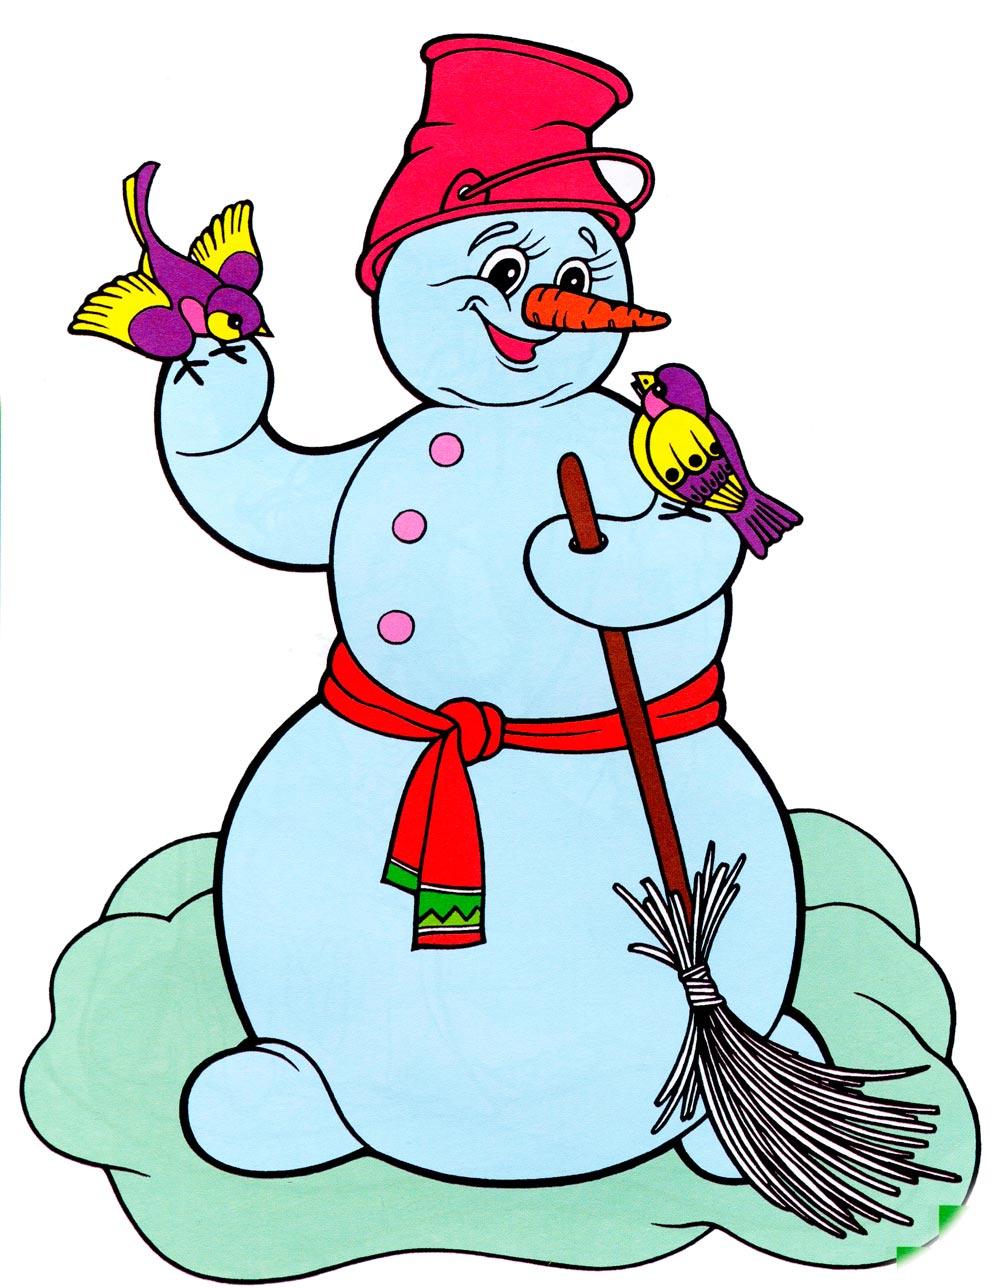 рисунки и картинки снеговиков посчитал